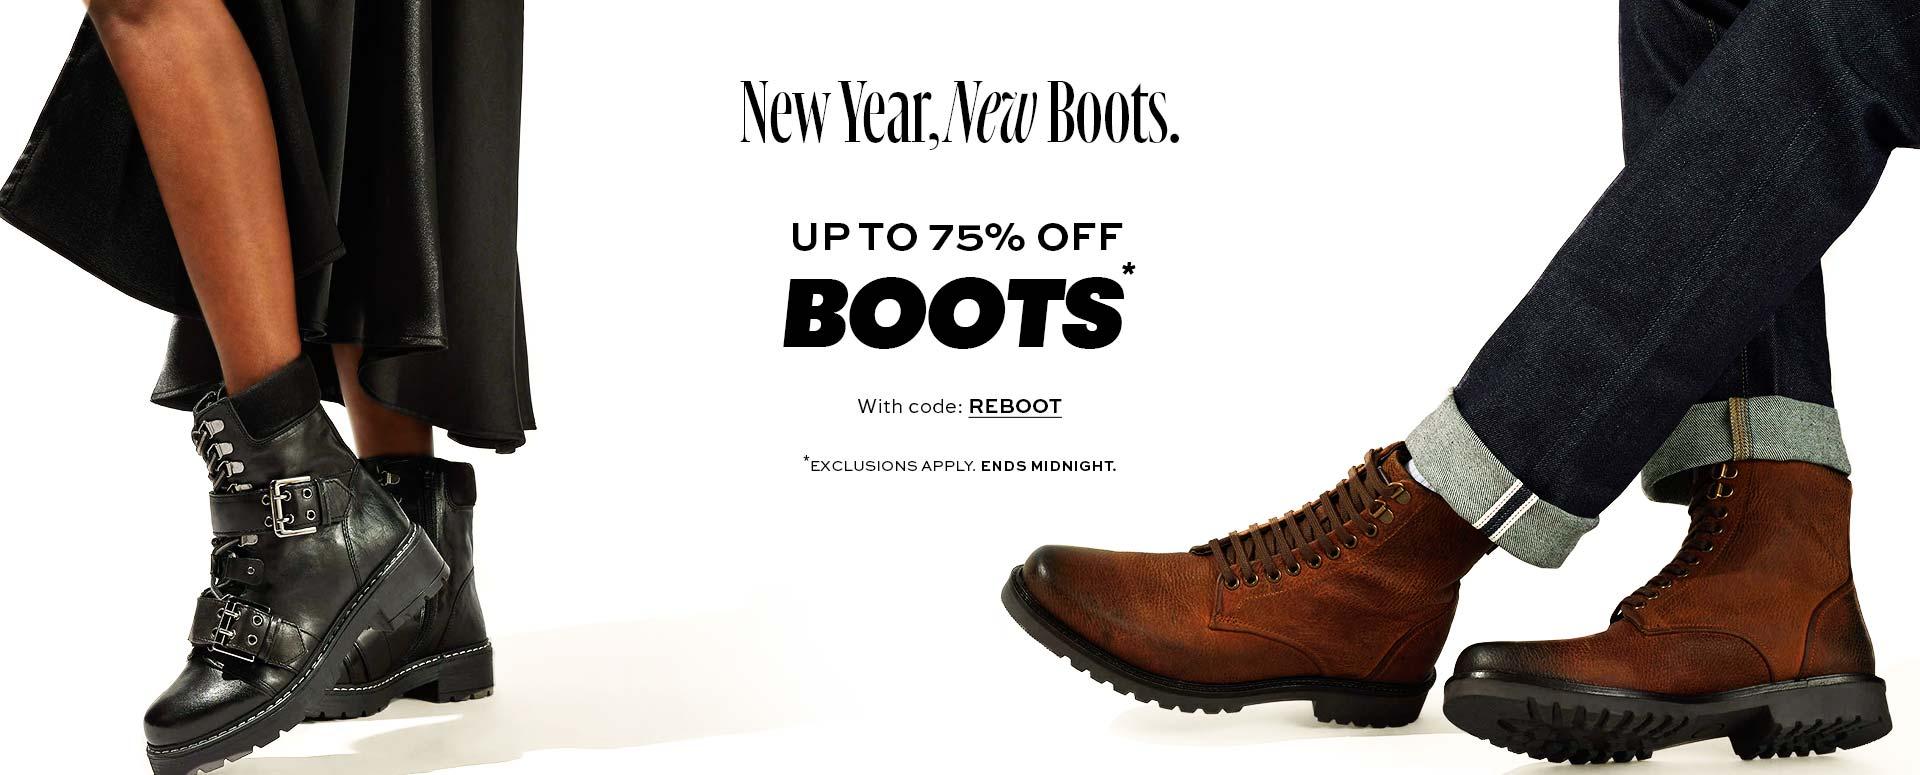 Shoeaholics | Discount Designer Outlet for Shoes & Accessories